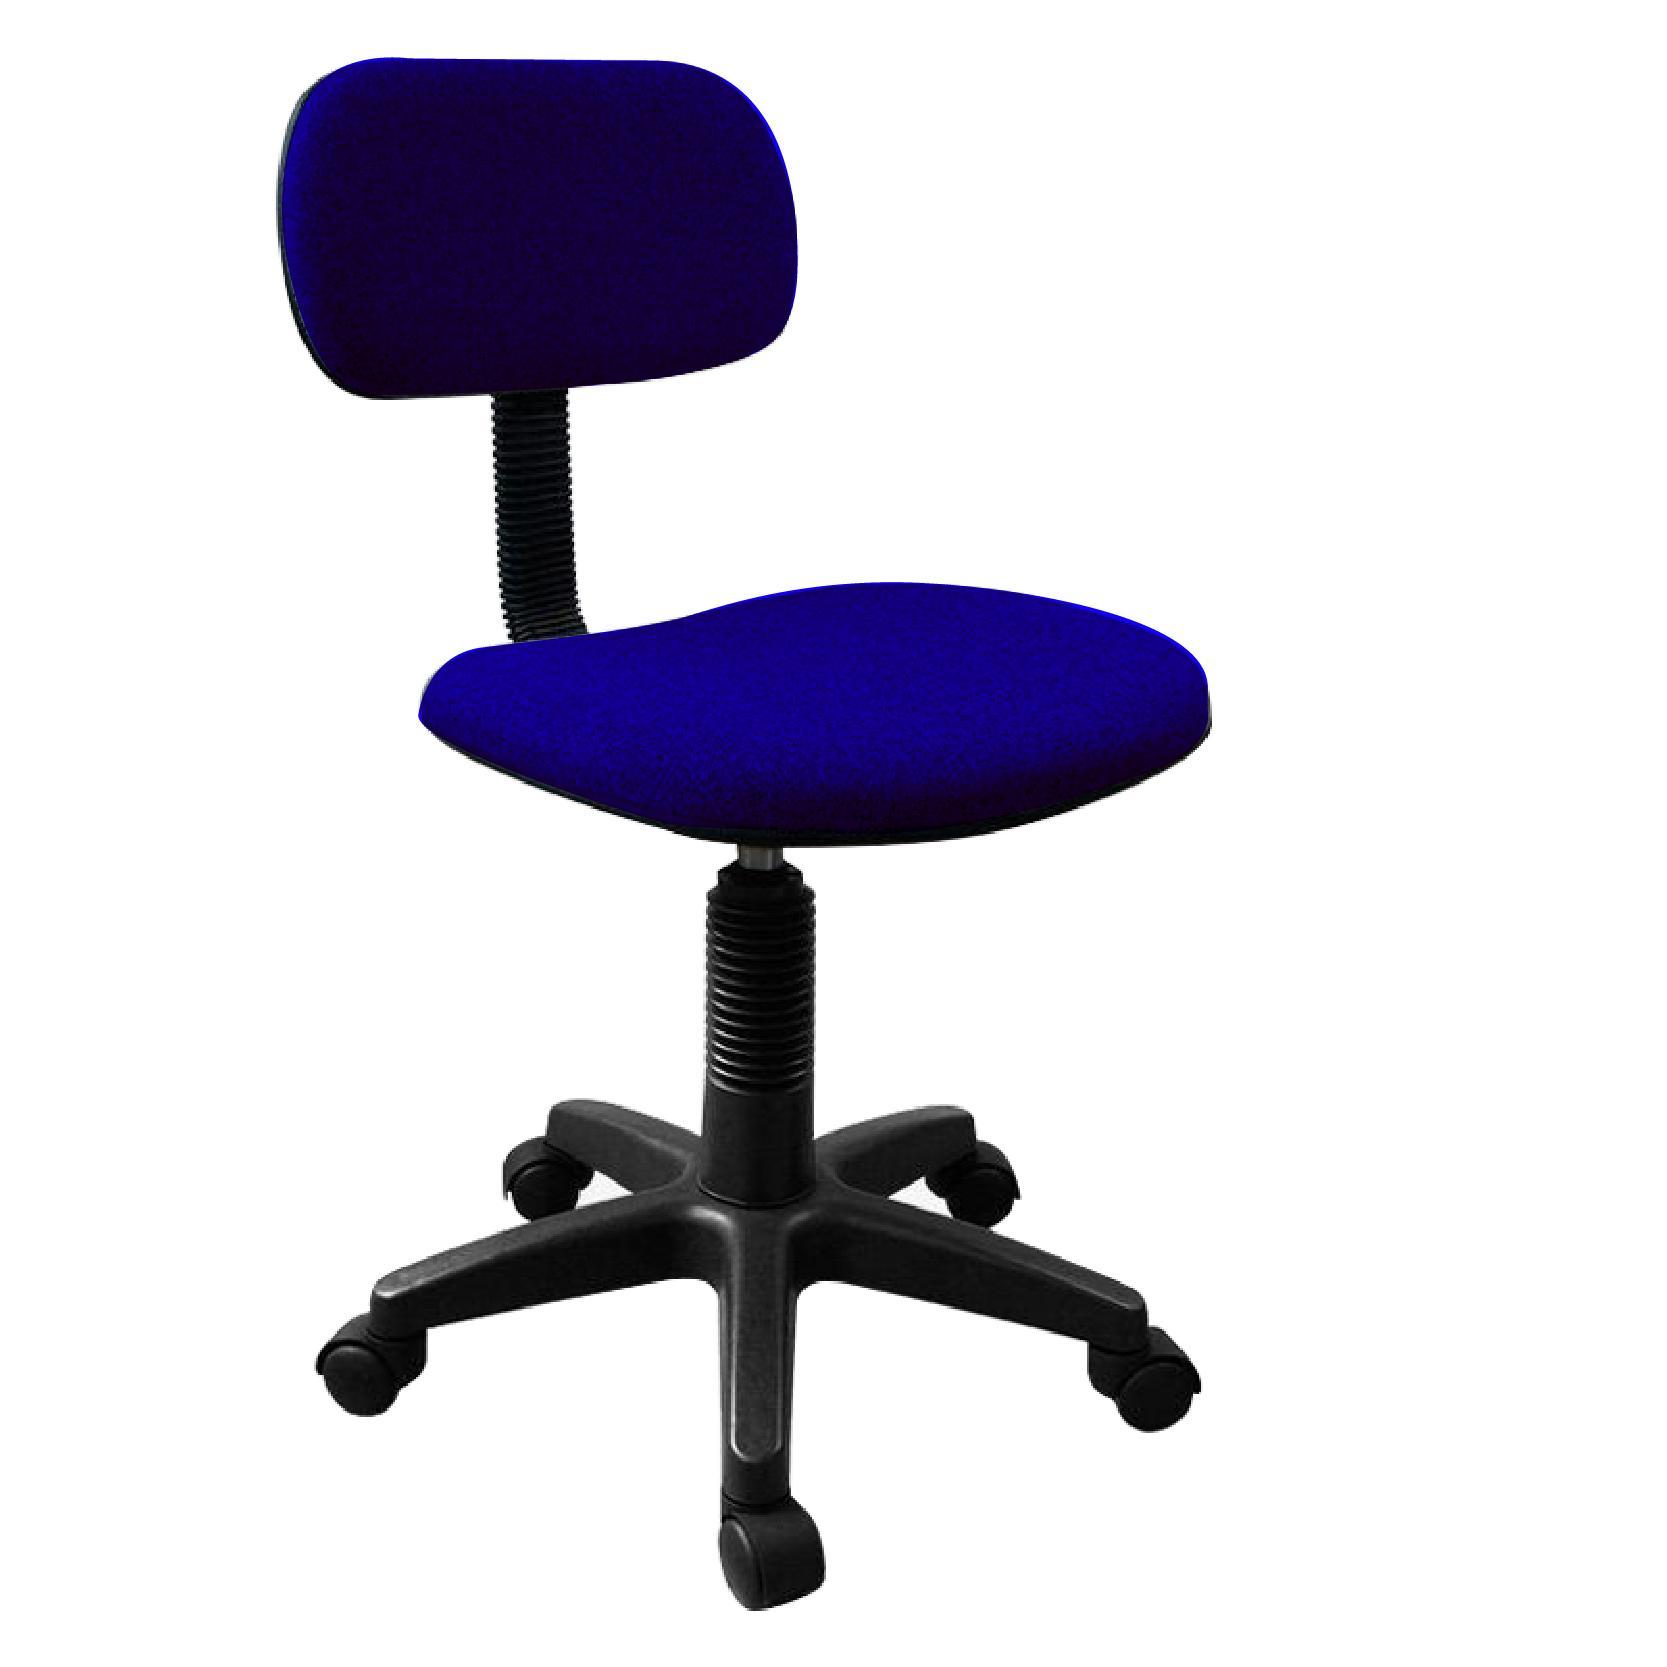 JIJI (Typist Chair Ver 2) / Office Chair / Ergonomic / chair w wheels / roller chair / 360 / Free Installation / 12 Month Warranty / (SG) Singapore